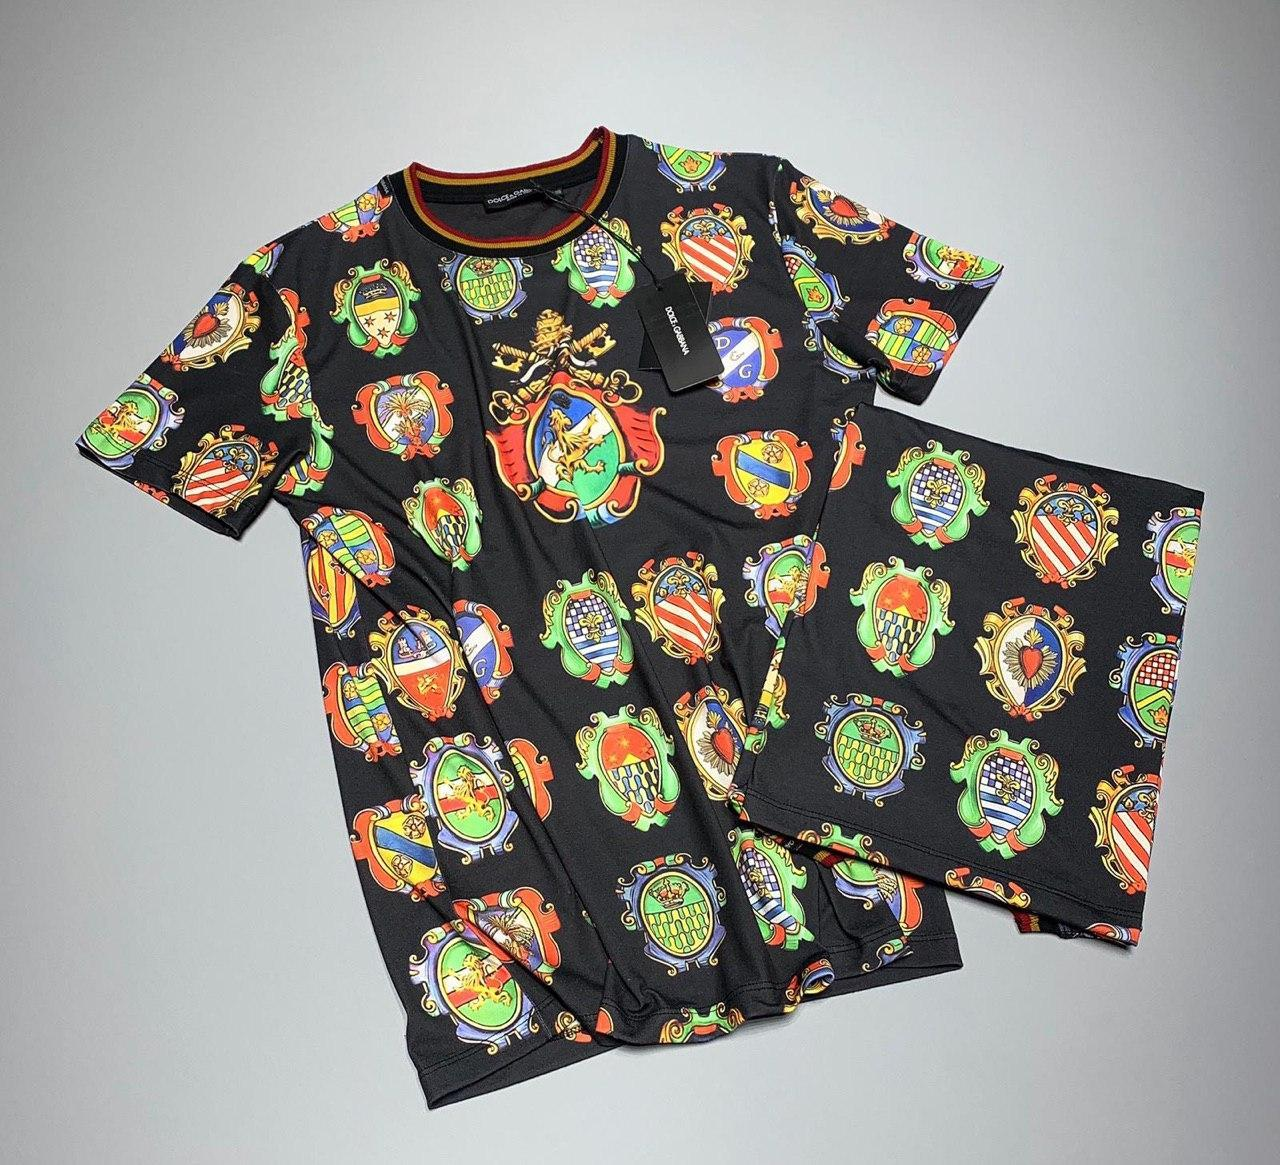 Мужская футболка Dolce & Gabbana M024 разноцветная